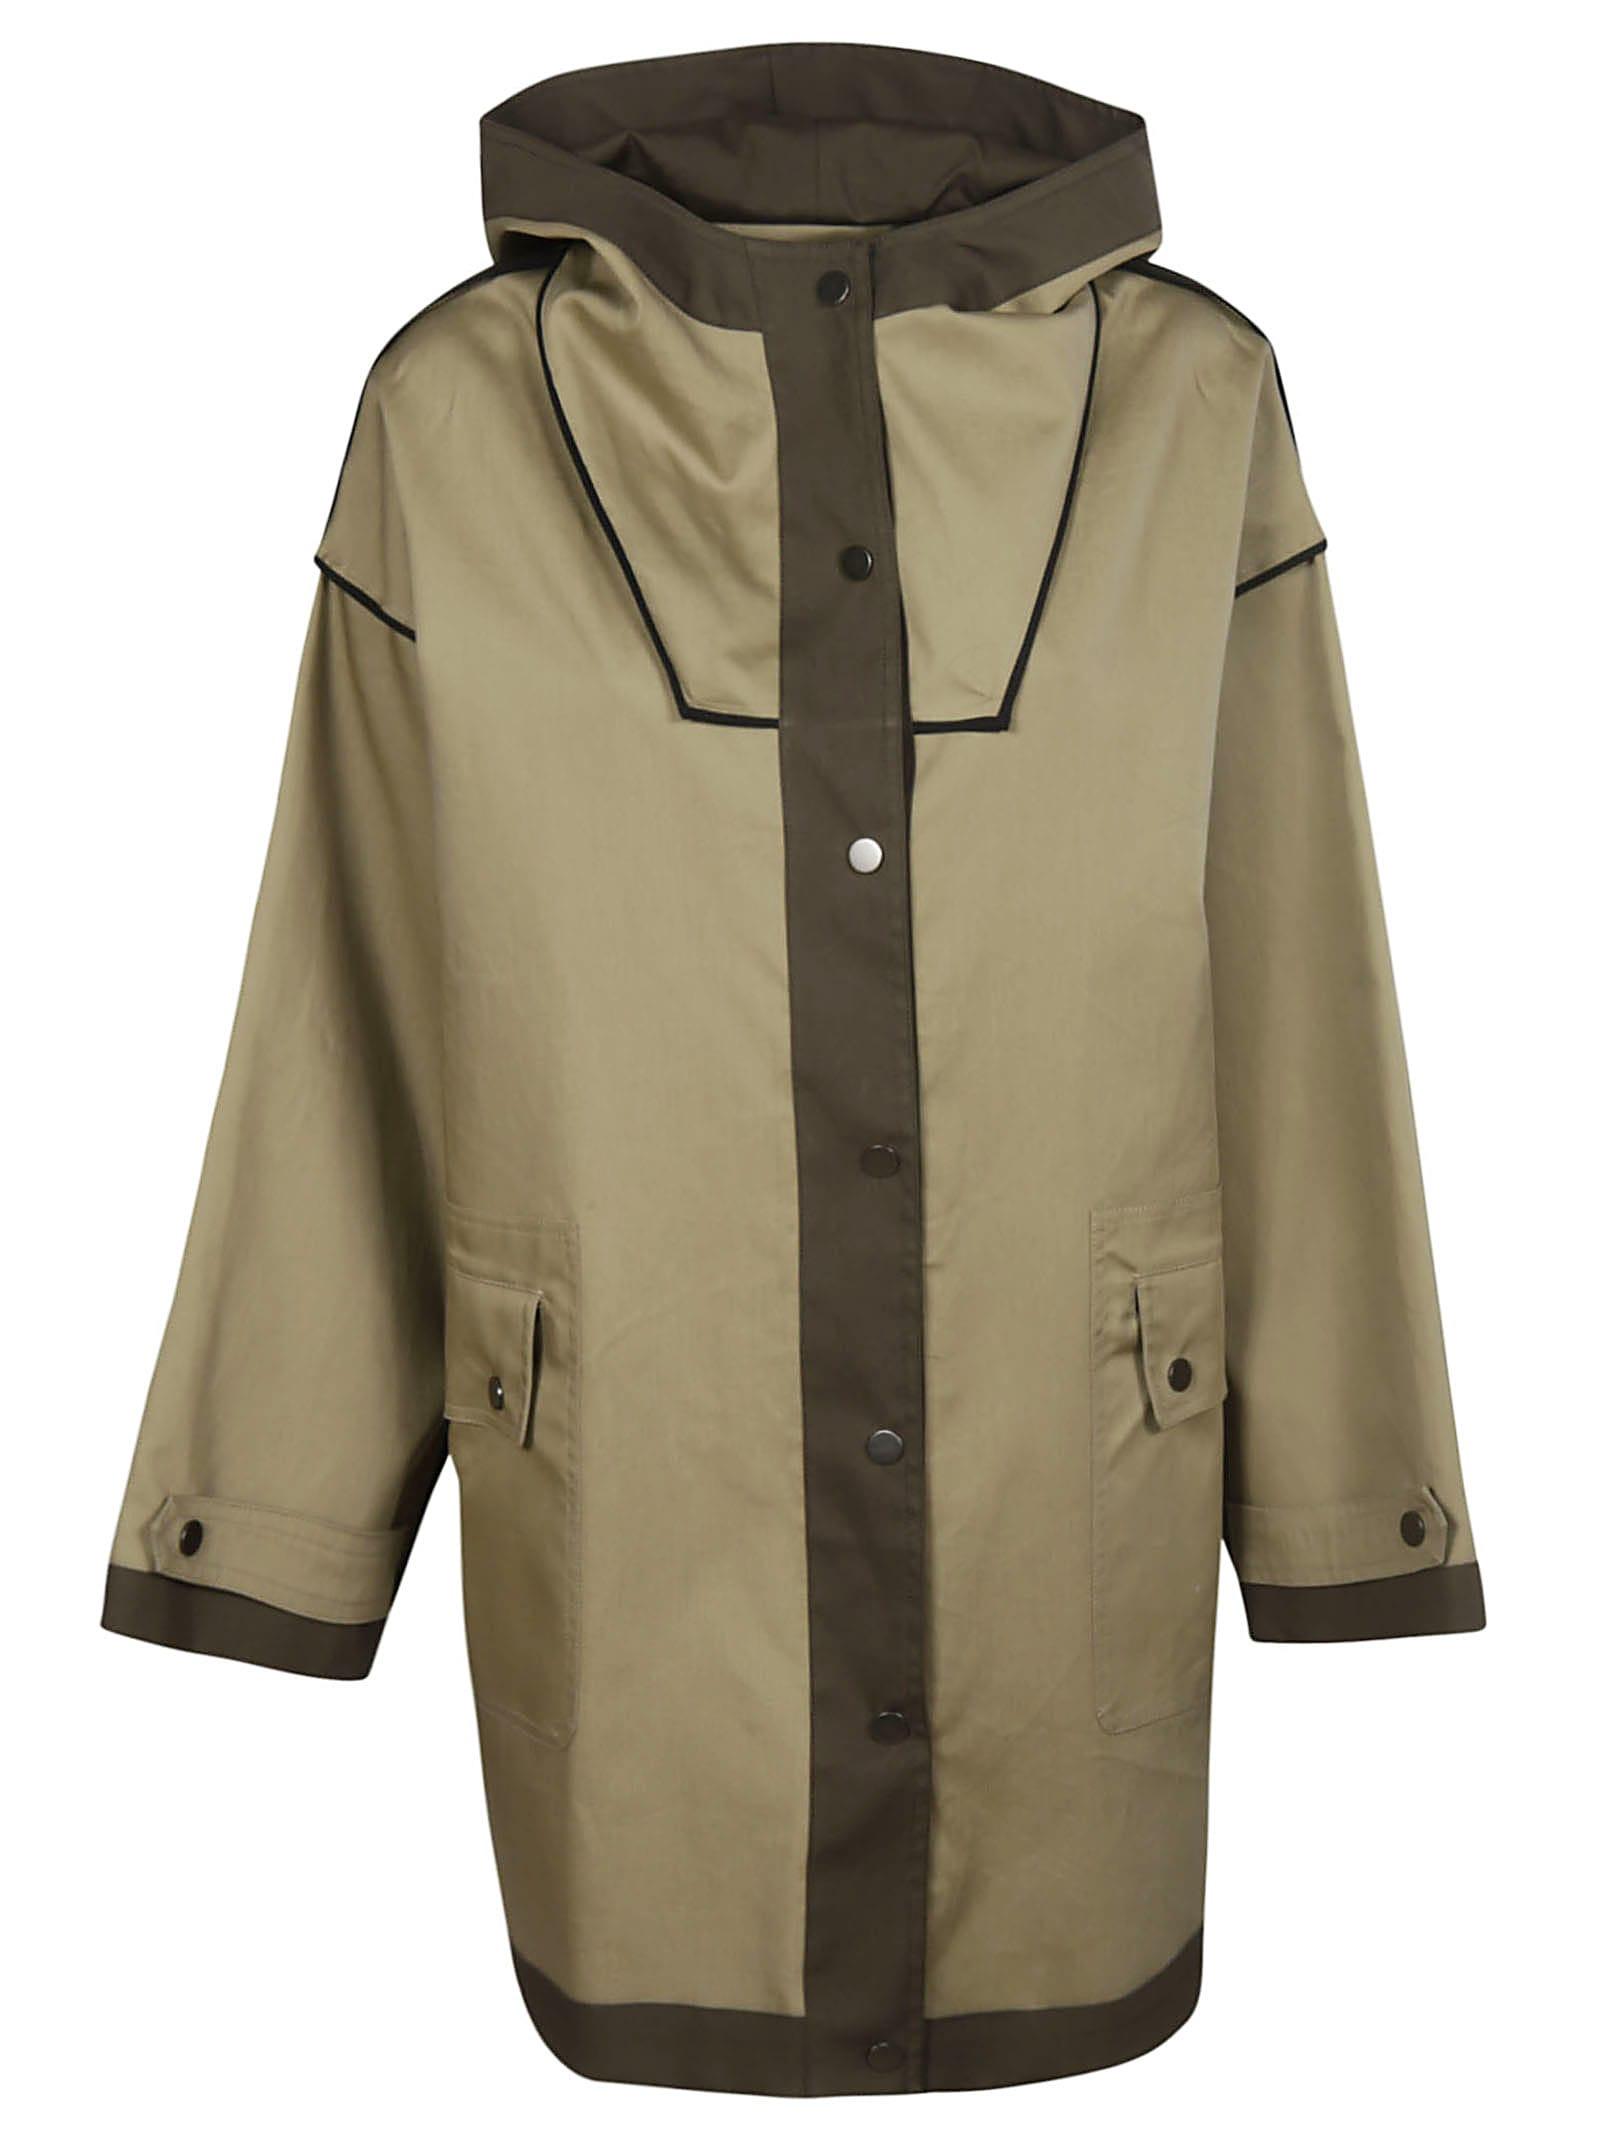 Erika Cavallini Button-Up Hooded Coat